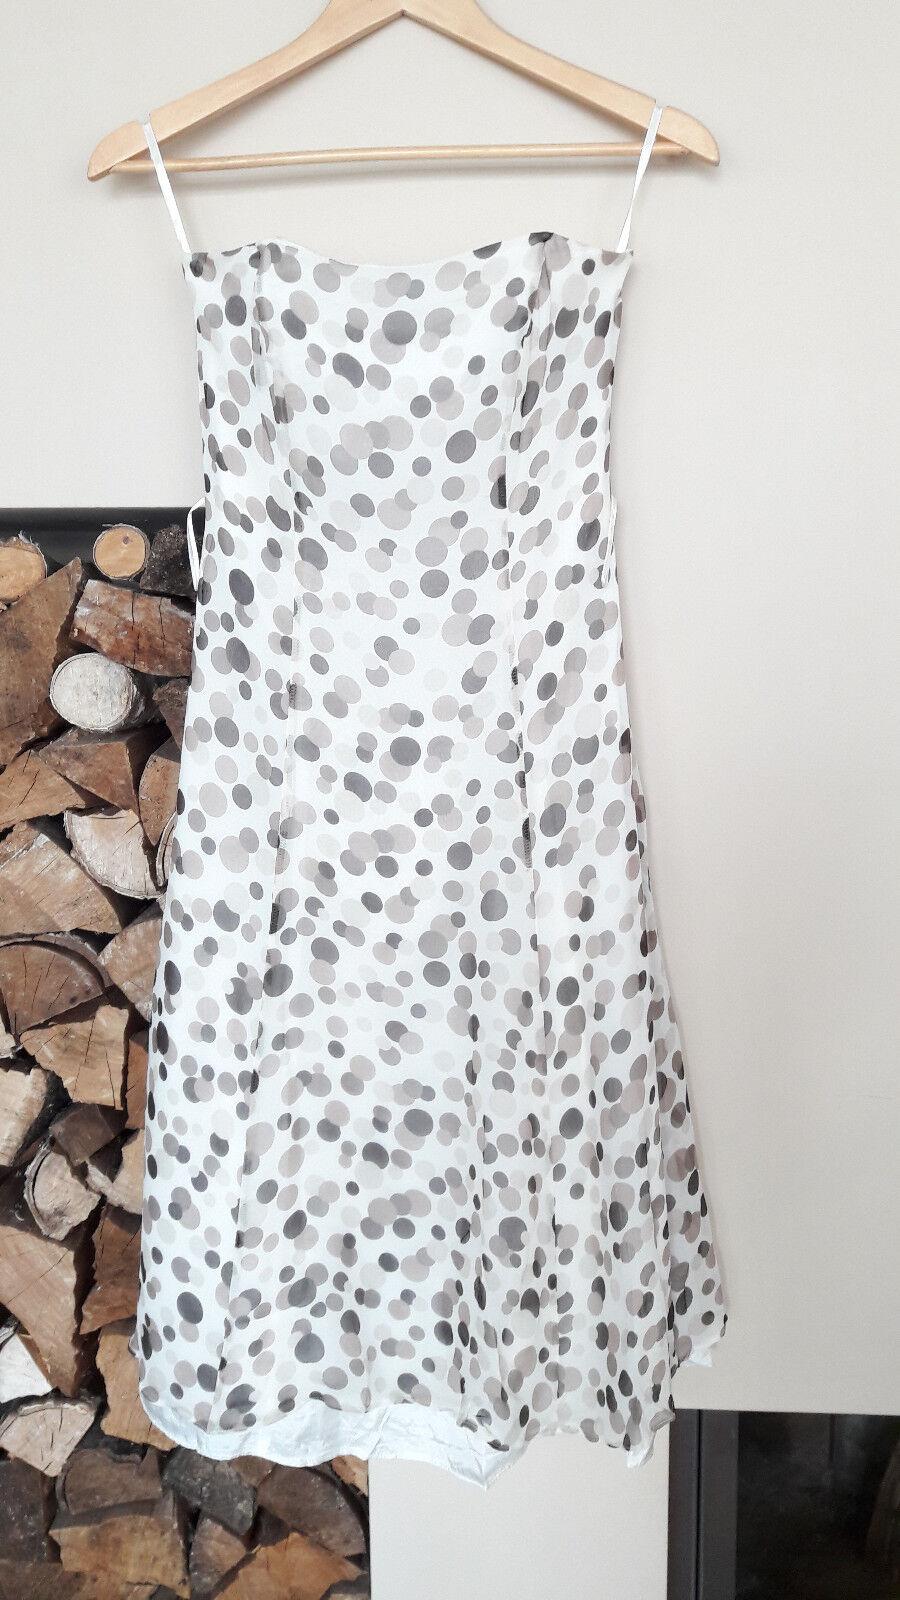 Debut Début Kleid Sommerkleid Gr. 34 100 % Seide gepunktet